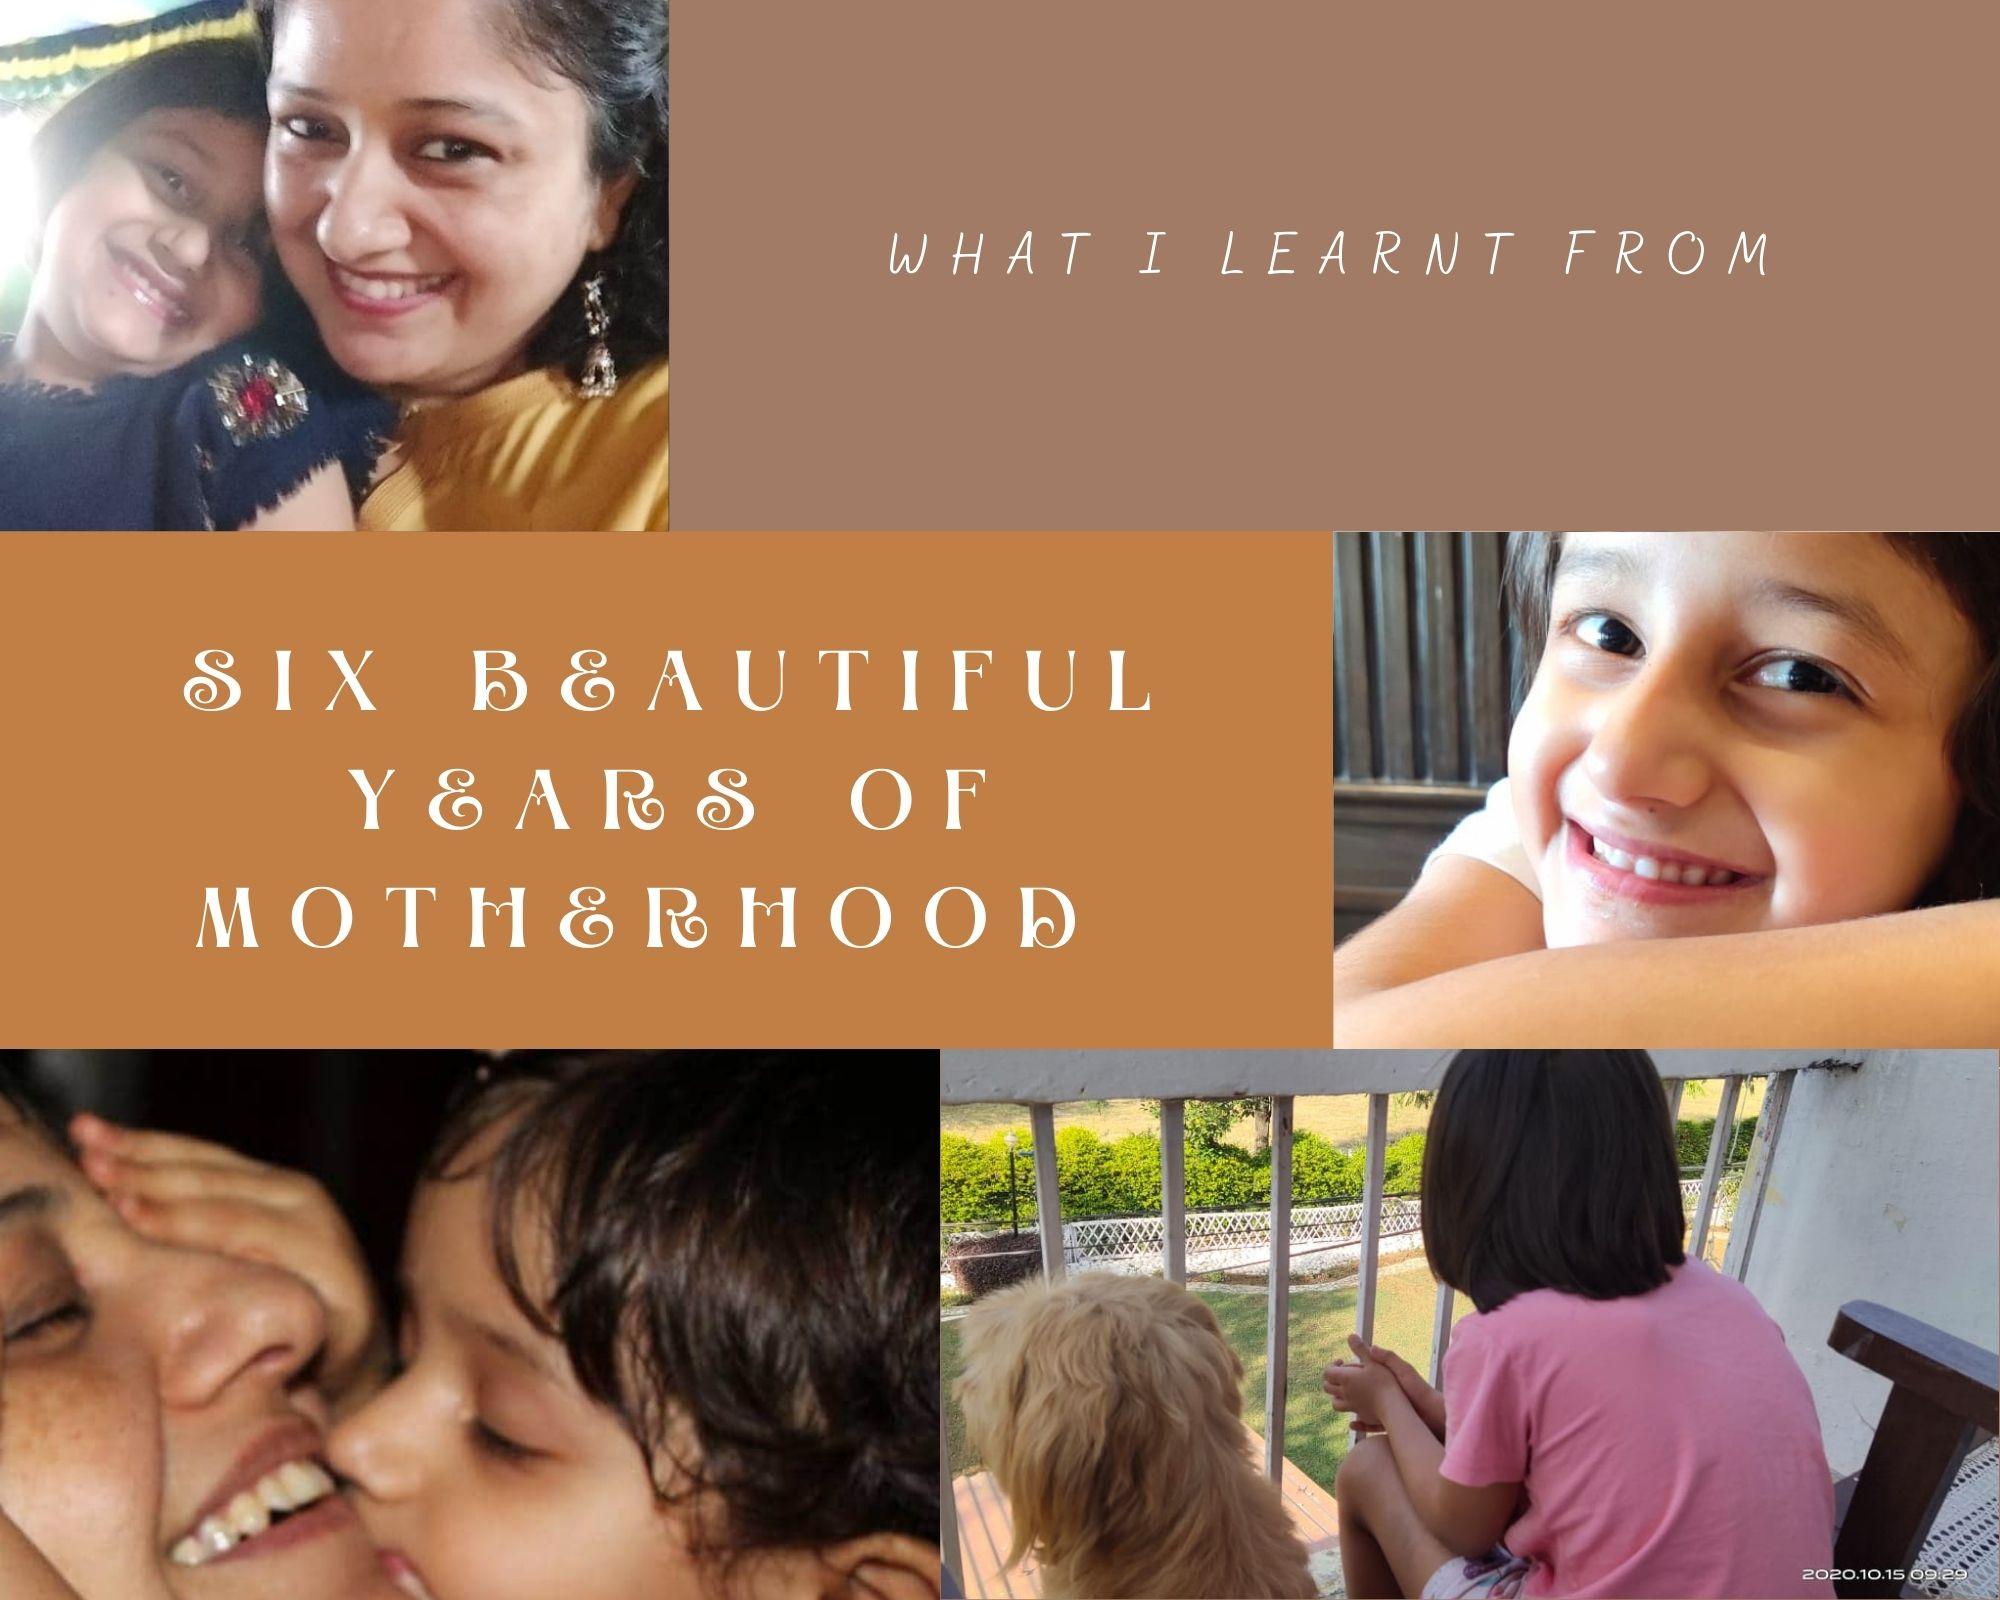 Motherhood – 6 beautiful years of raising Myra